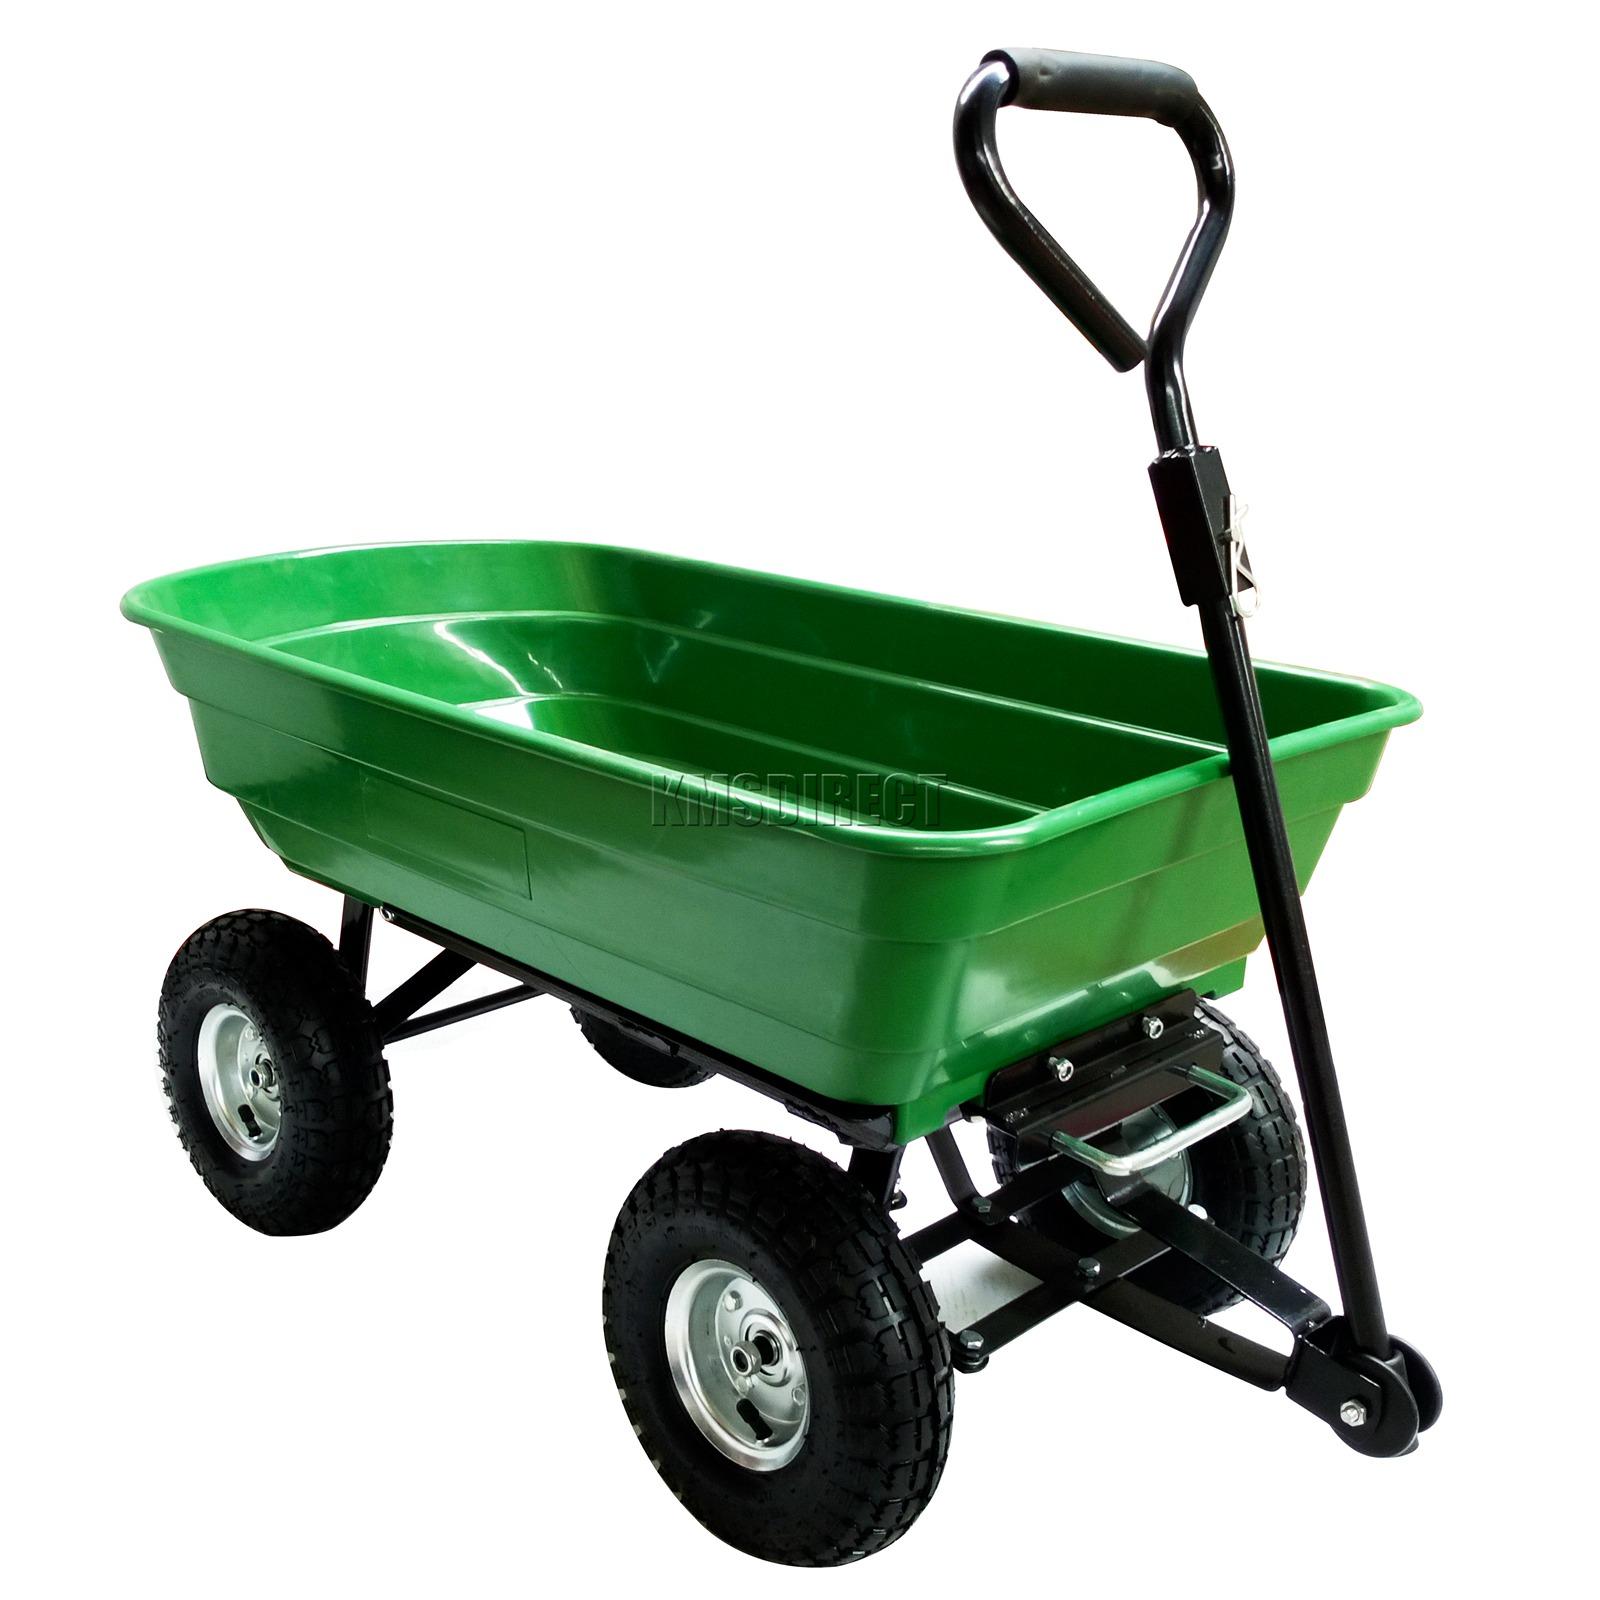 FoxHunter-Heavy-Duty-Garden-Dump-Truck-Tipping-Trailer-Trolley-Cart-Wheelbarrow miniatuur 35